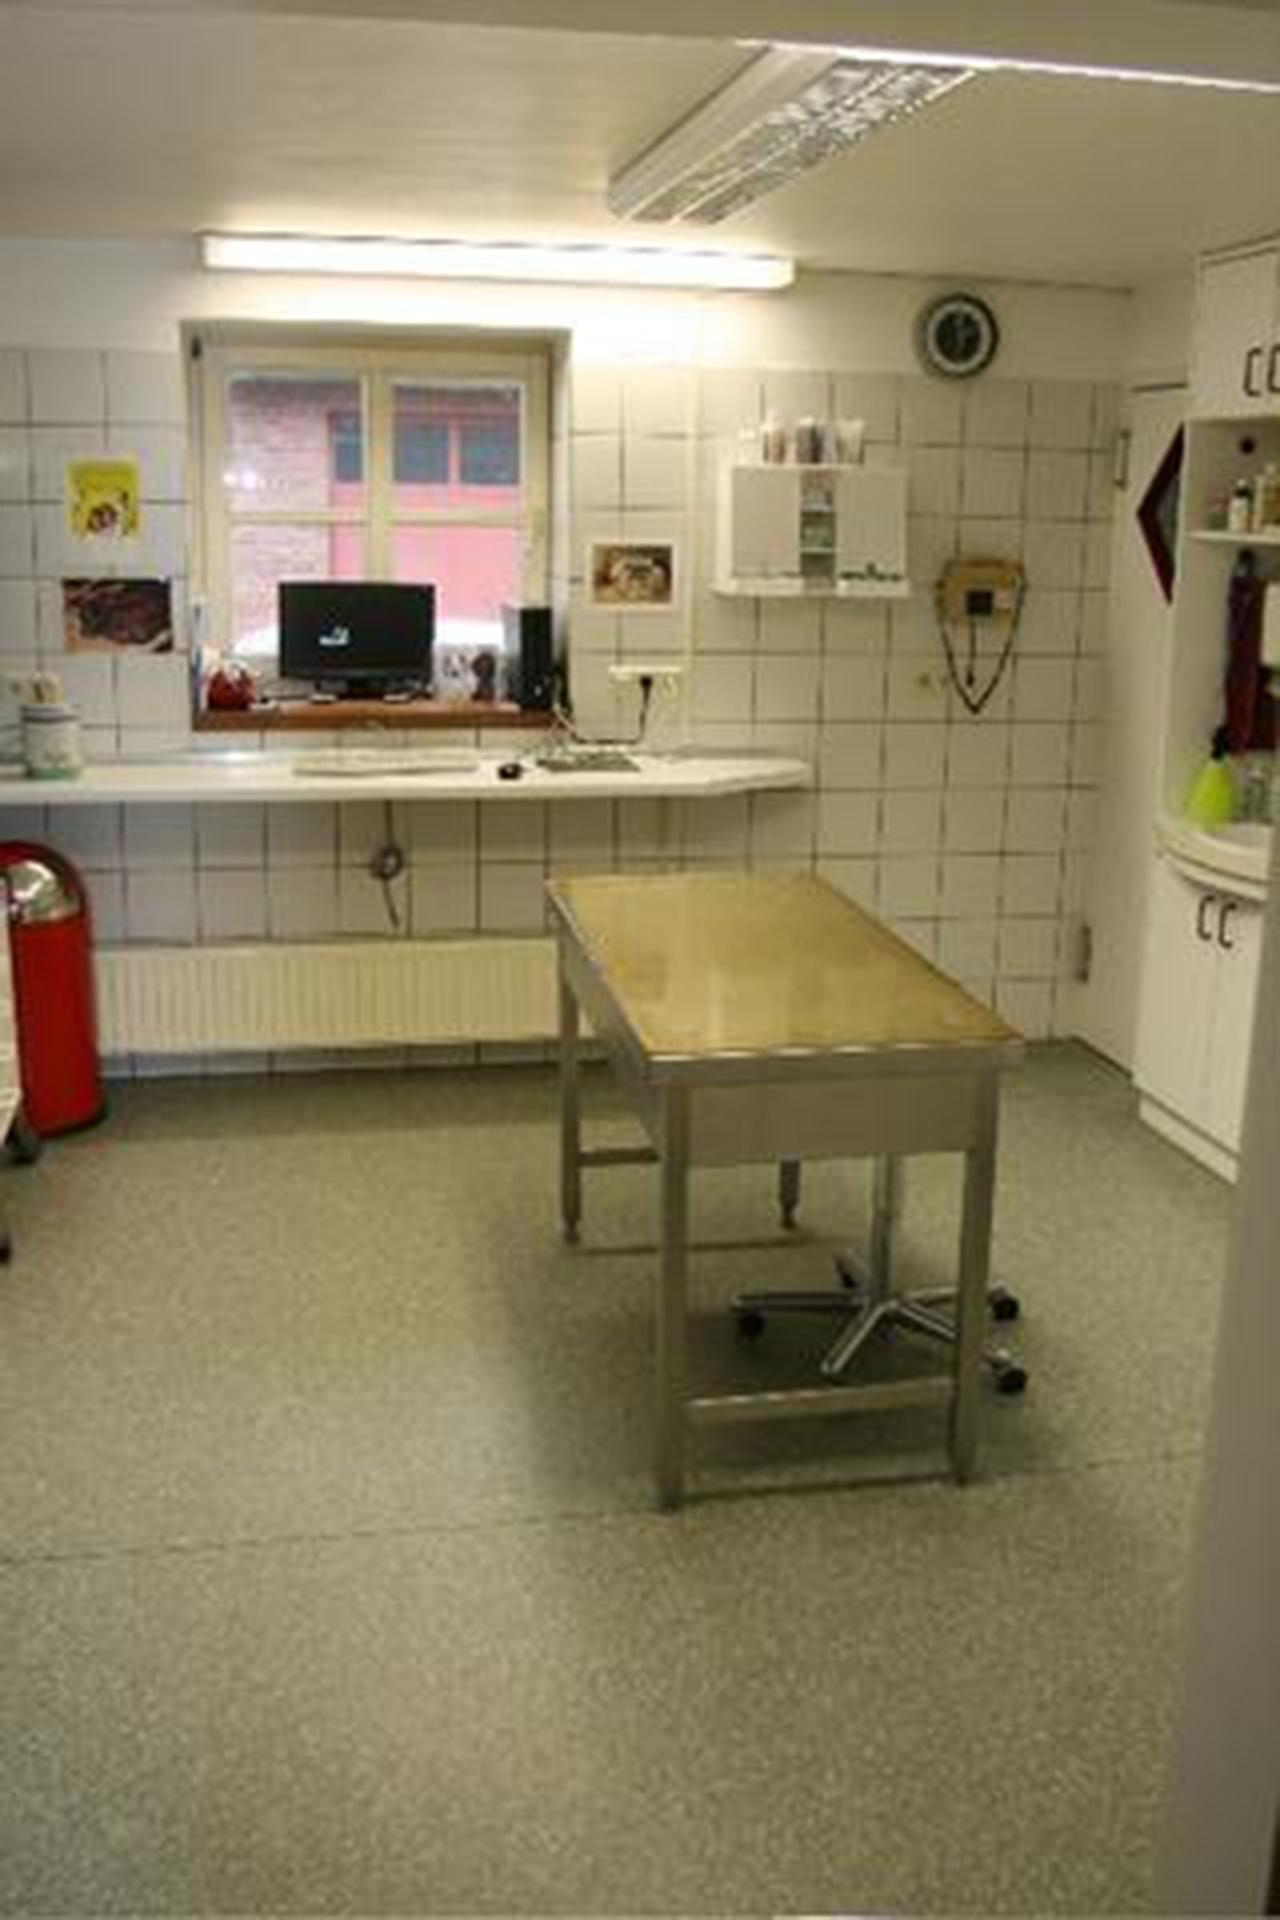 hesselmann tierarzt oberhausen